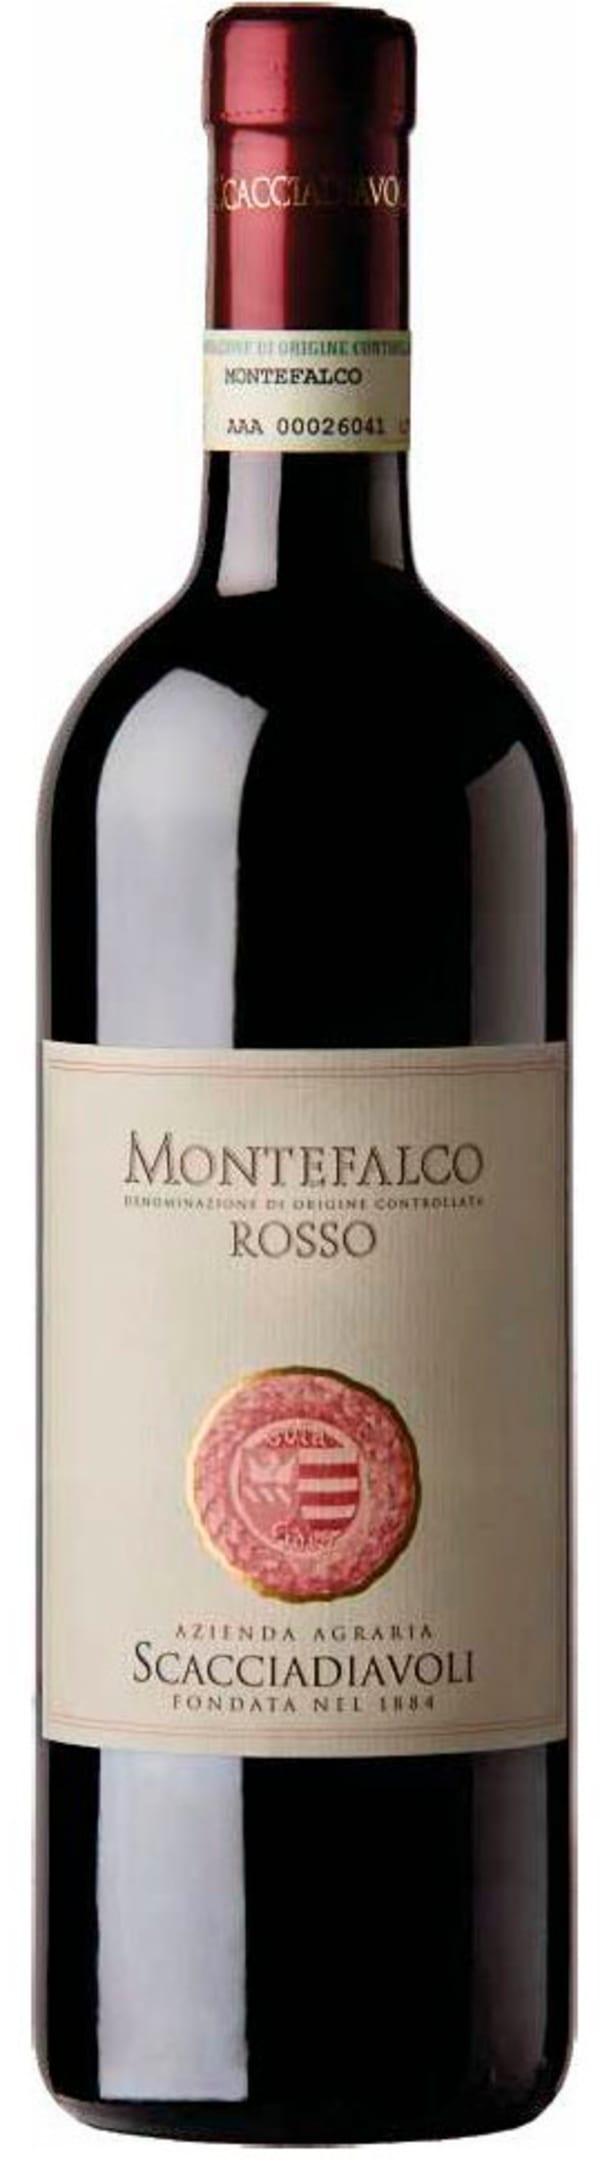 Scacciadiavoli Montefalco Rosso 2015